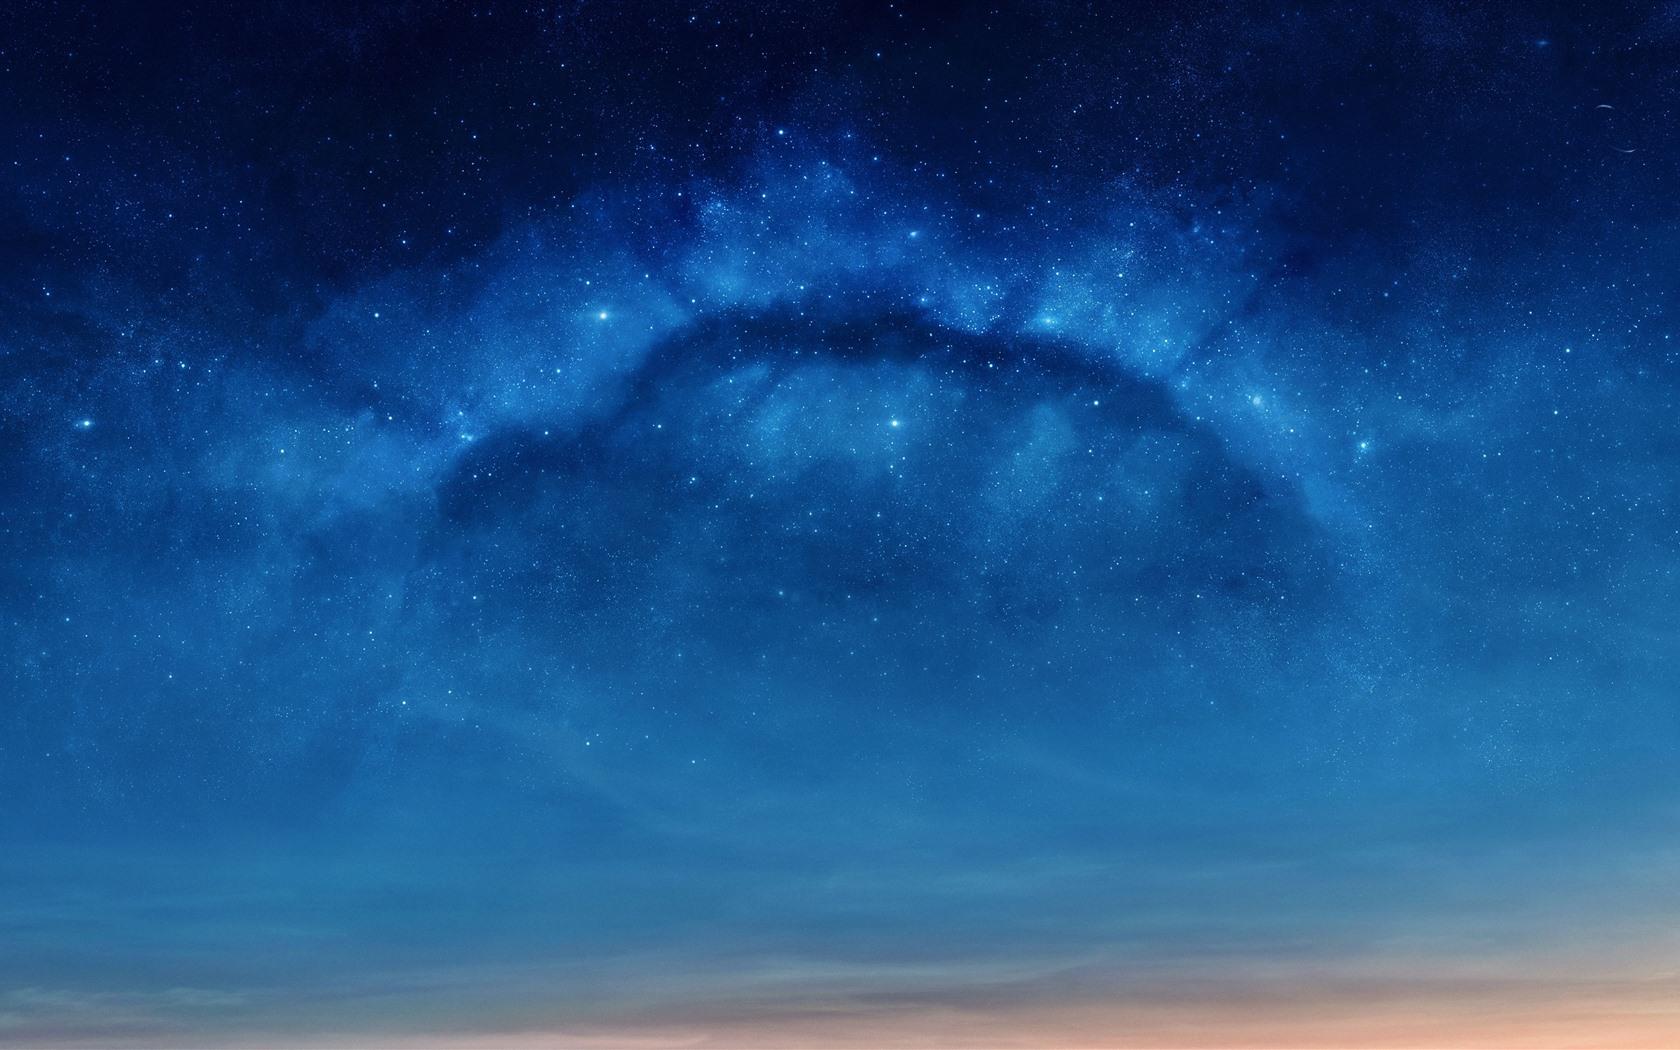 Wallpaper Stars Blue Sky Night 5120x2880 Uhd 5k Picture Image